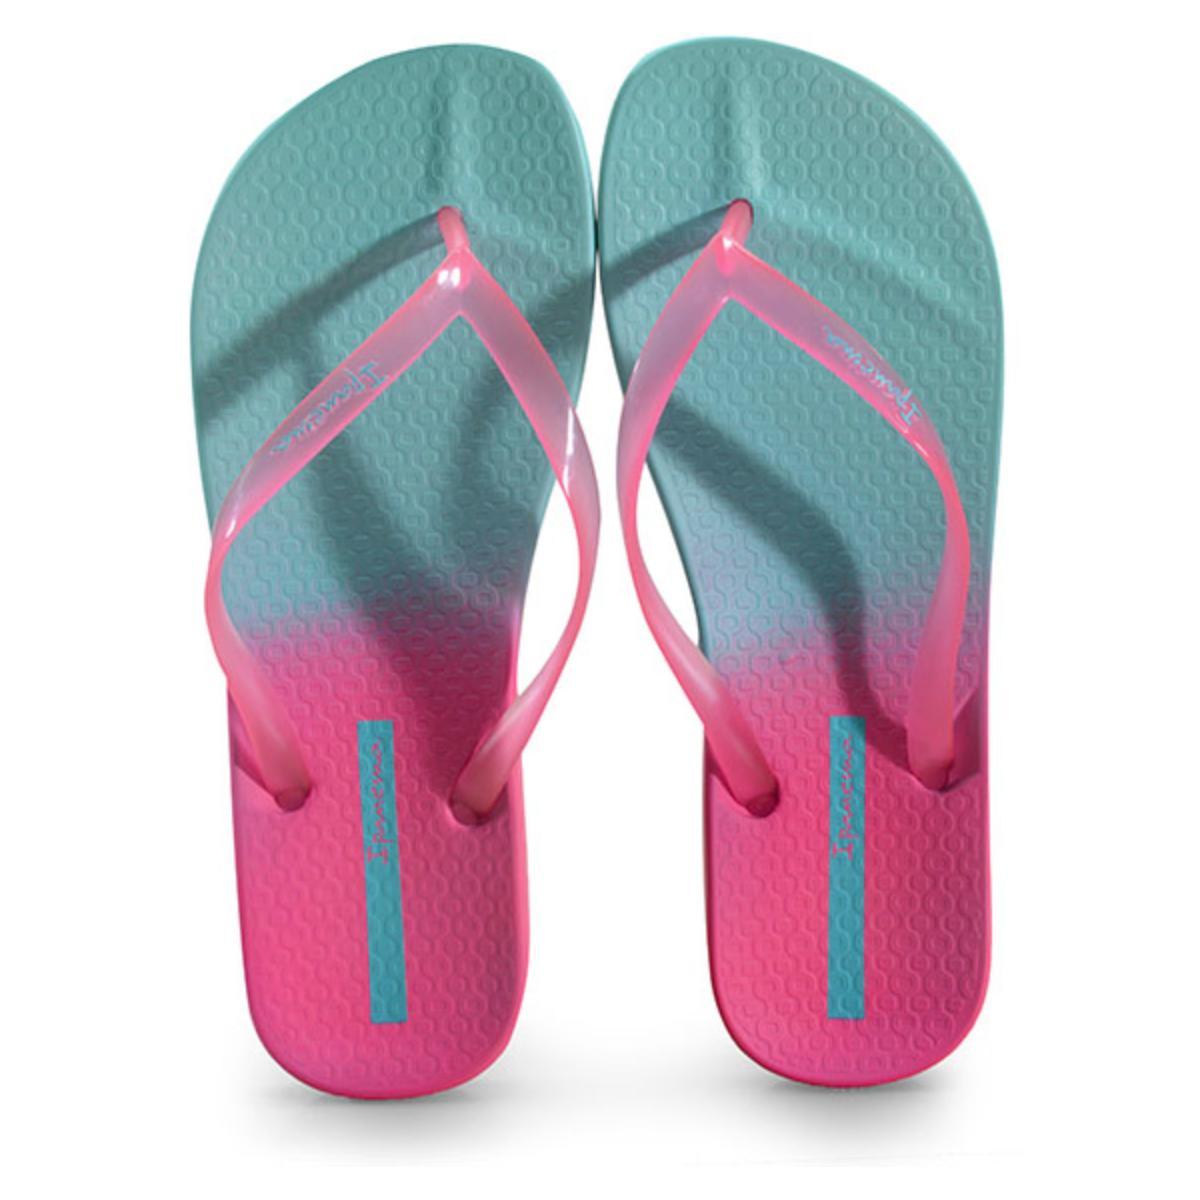 Chinelo Feminino Grendene 26525 25499 Ipanema Colors  Azul/rosa